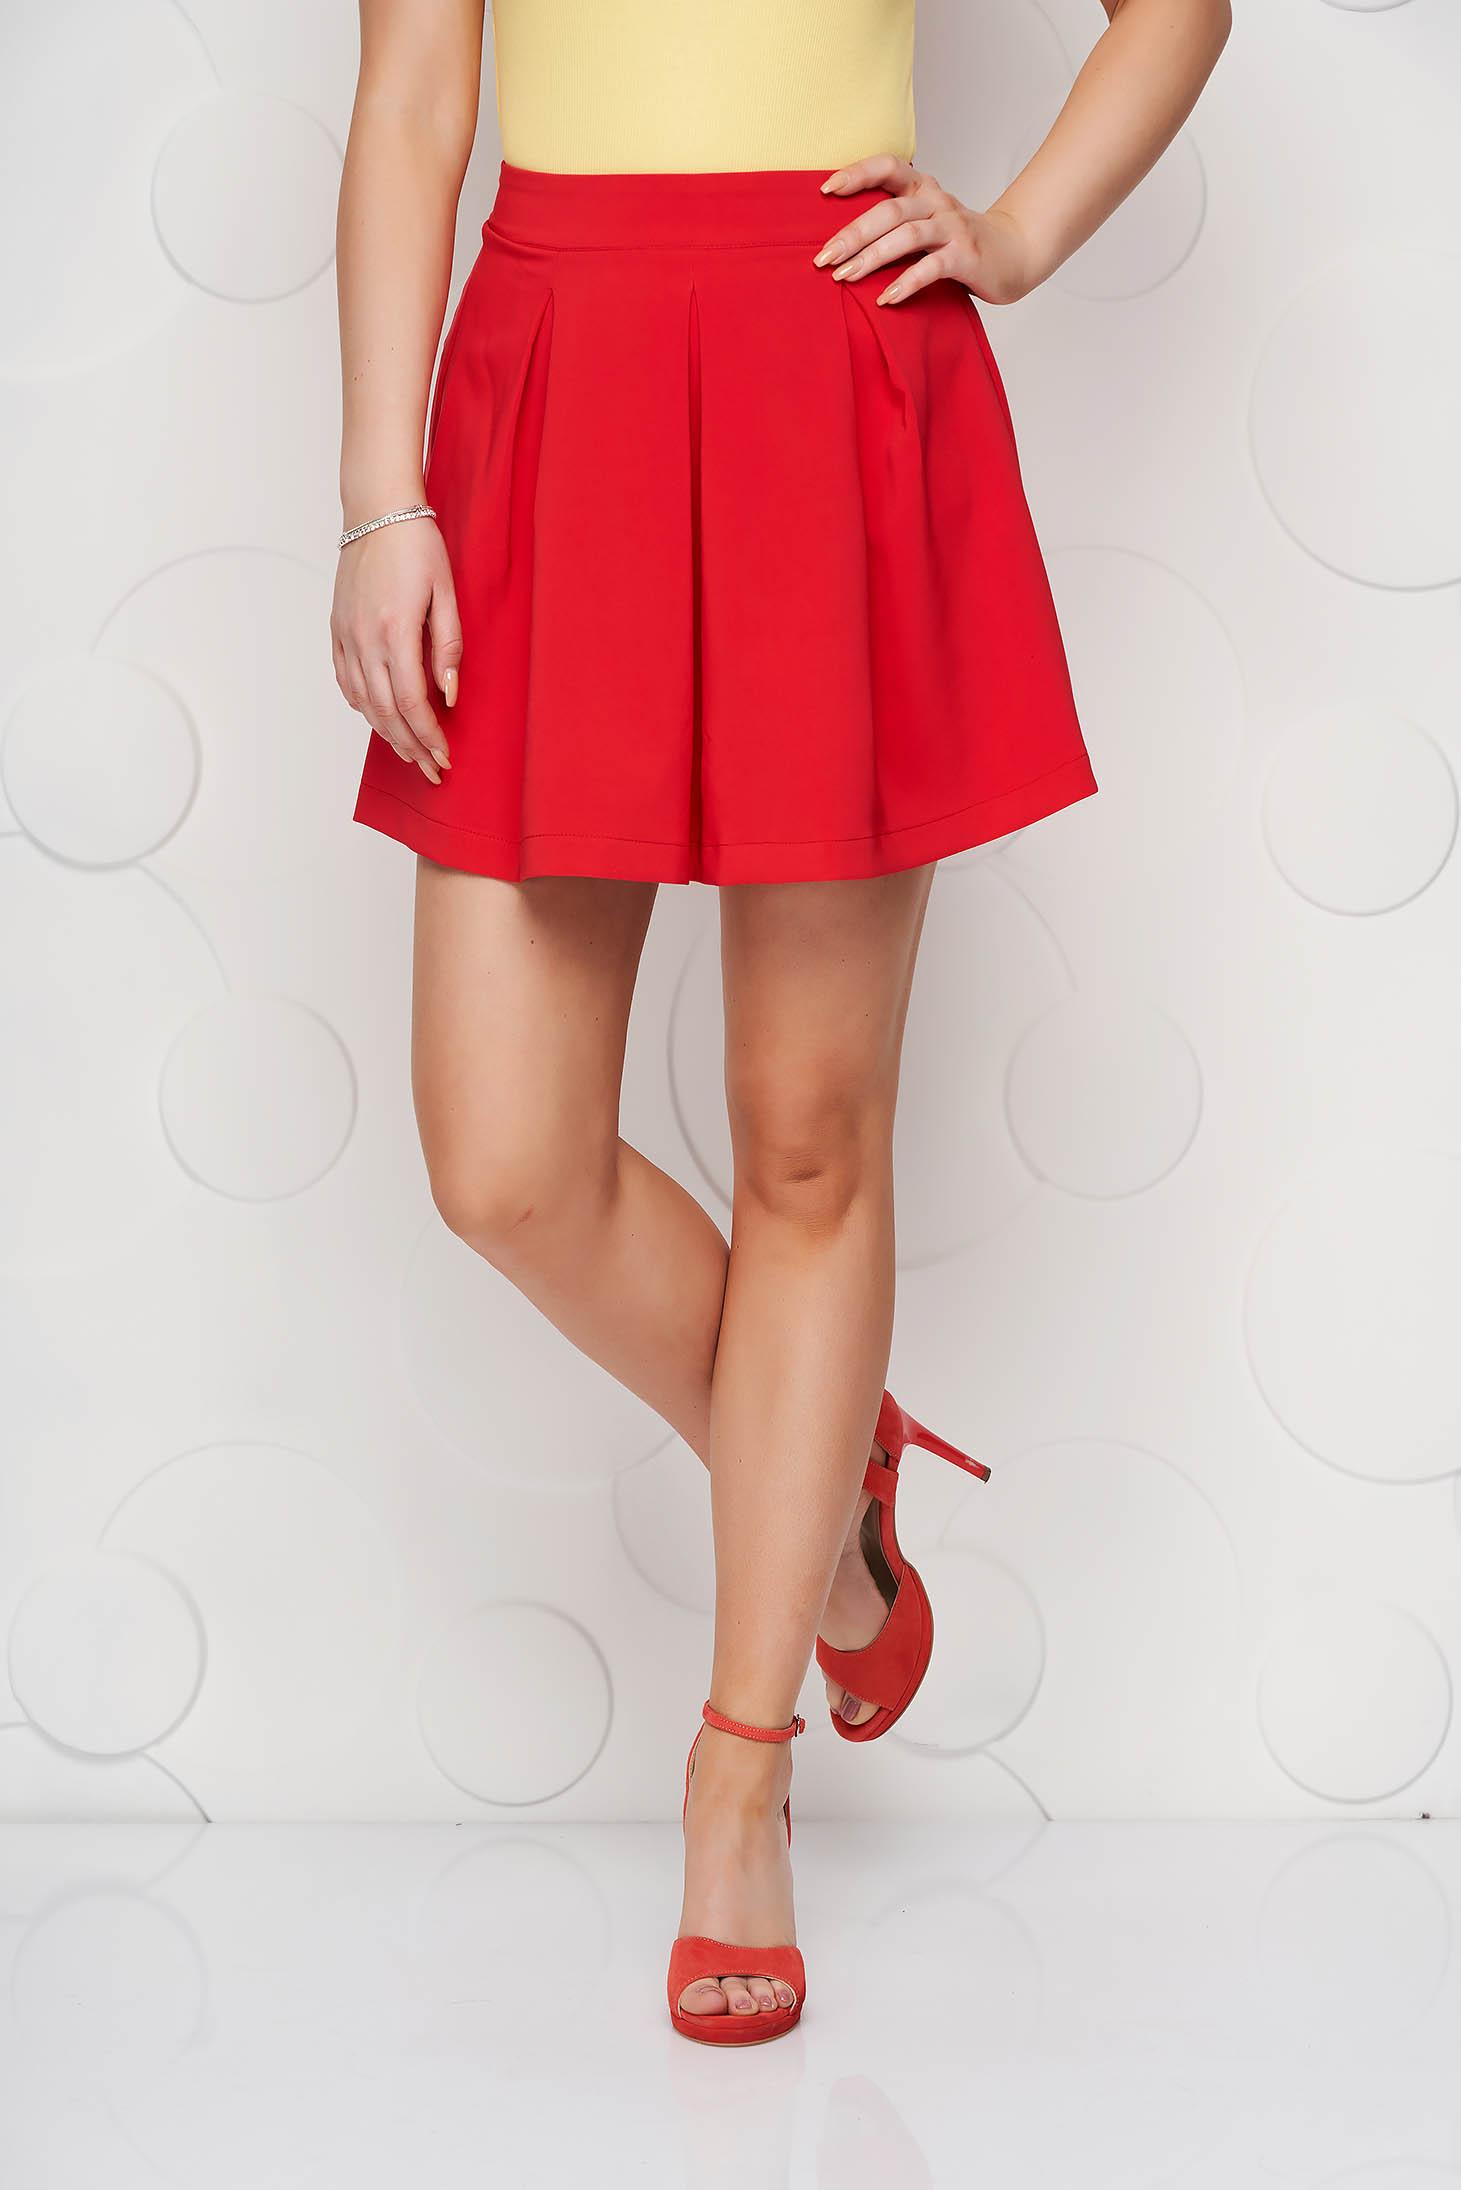 Coral casual cloche skirt slightly elastic fabric medium waist